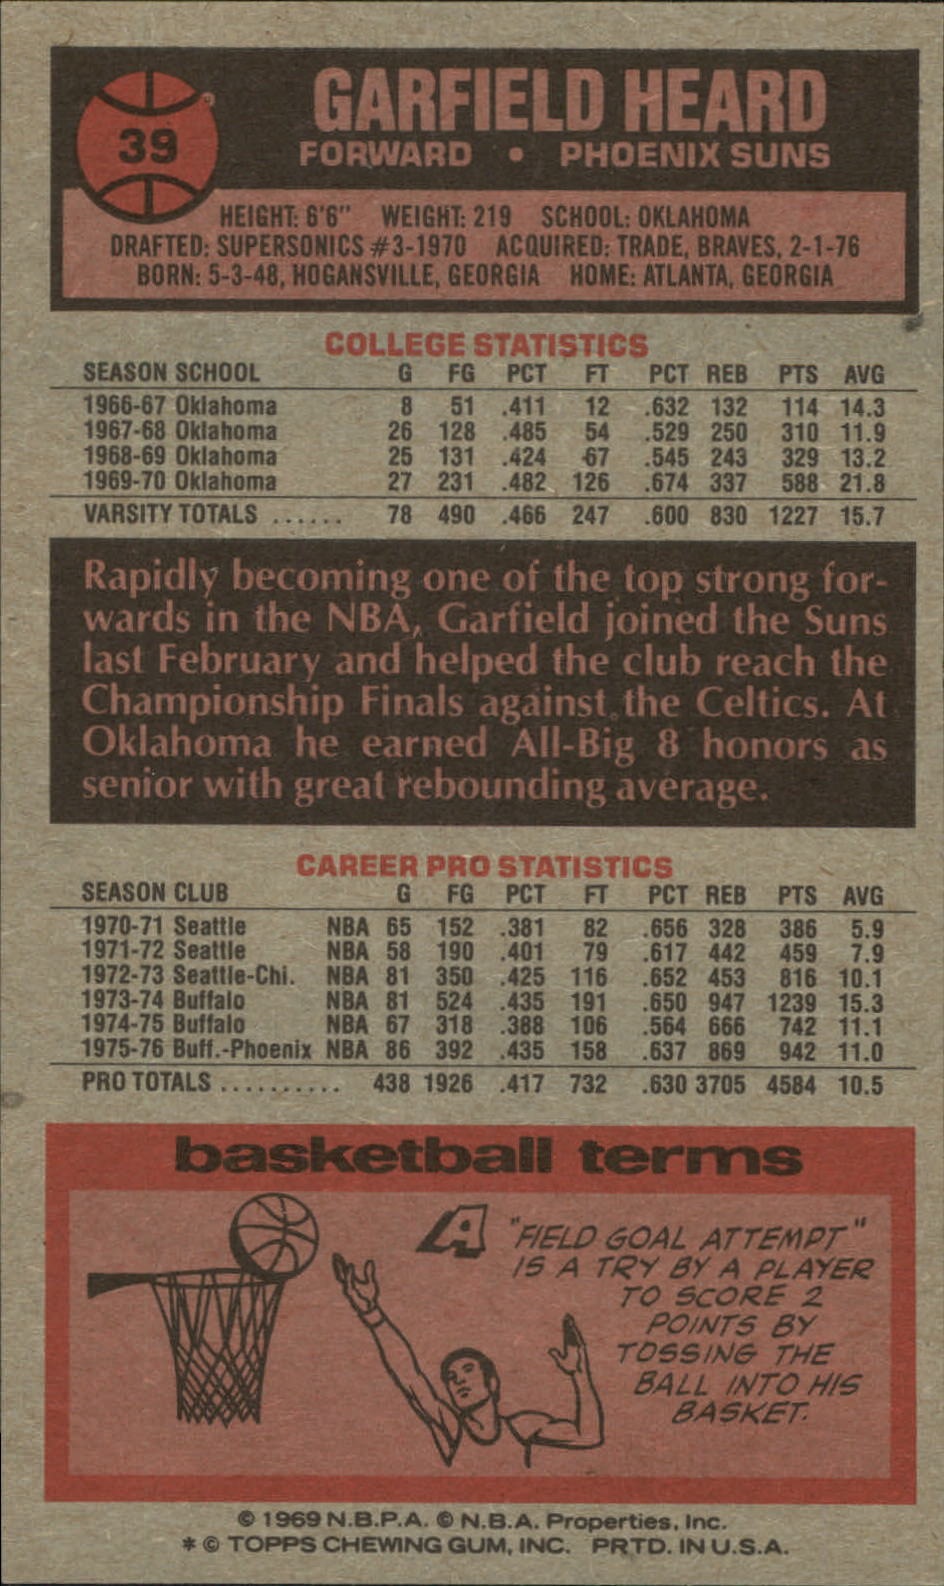 1976-77 Topps #39 Garfield Heard back image